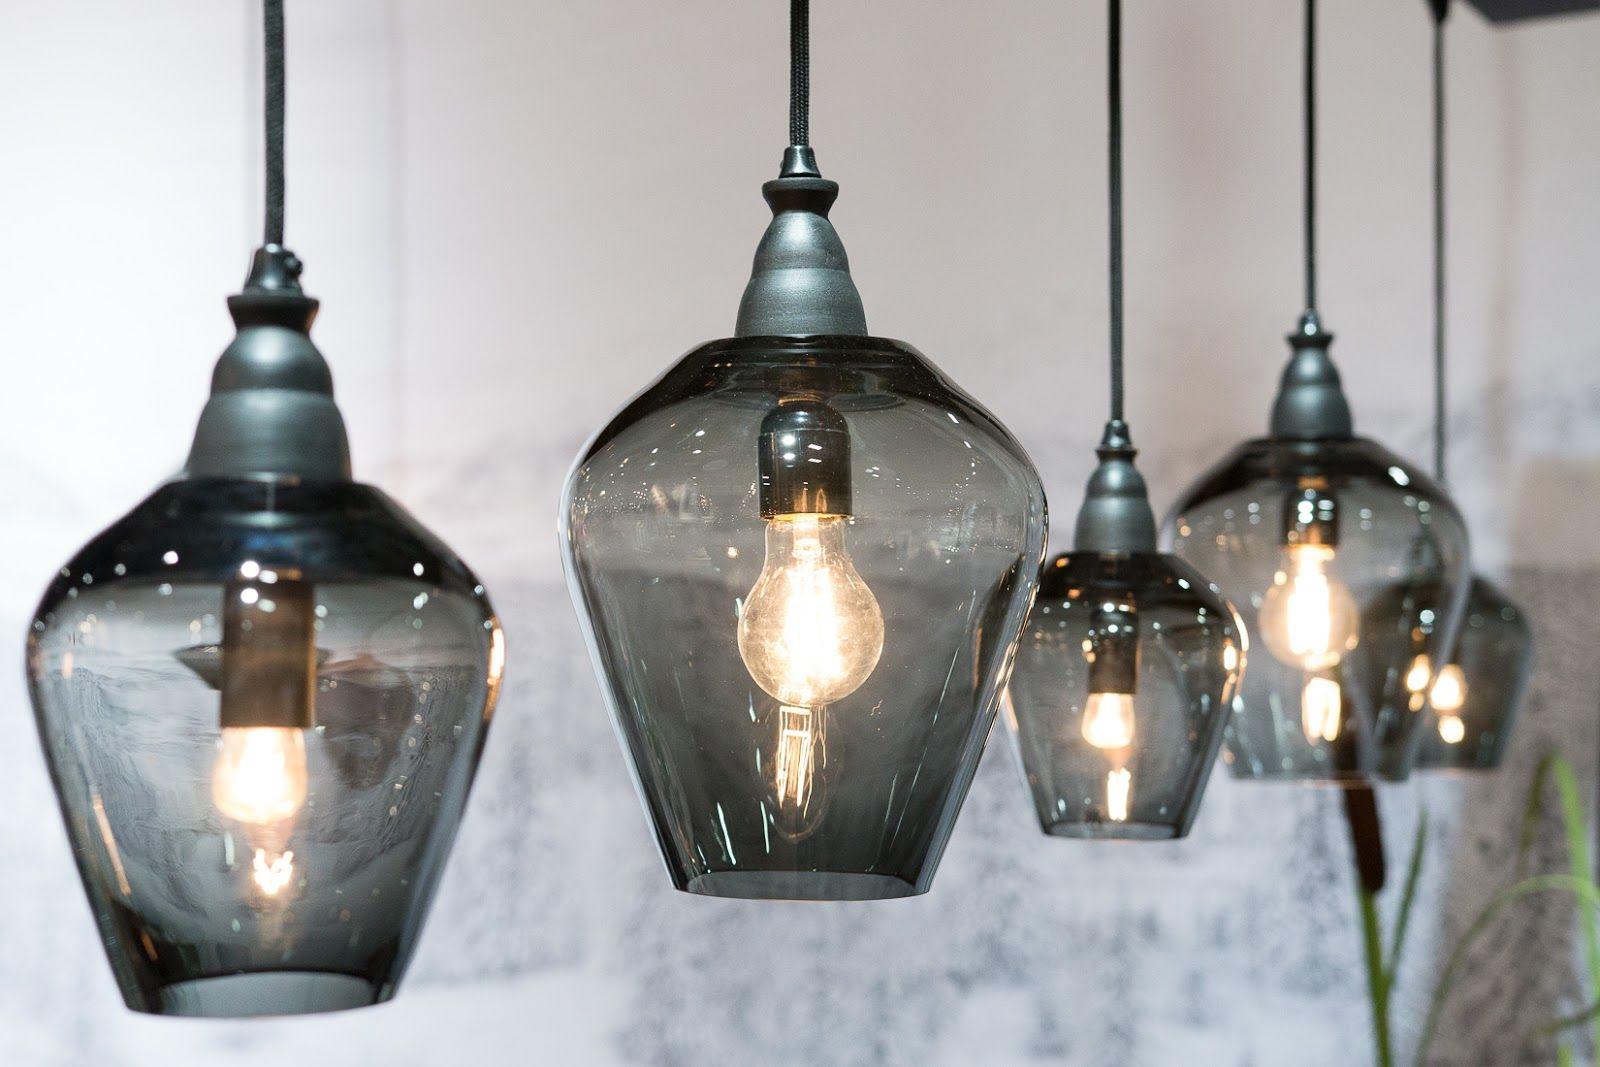 40 Best Huset Lamper images in 2020   Lighting, Light